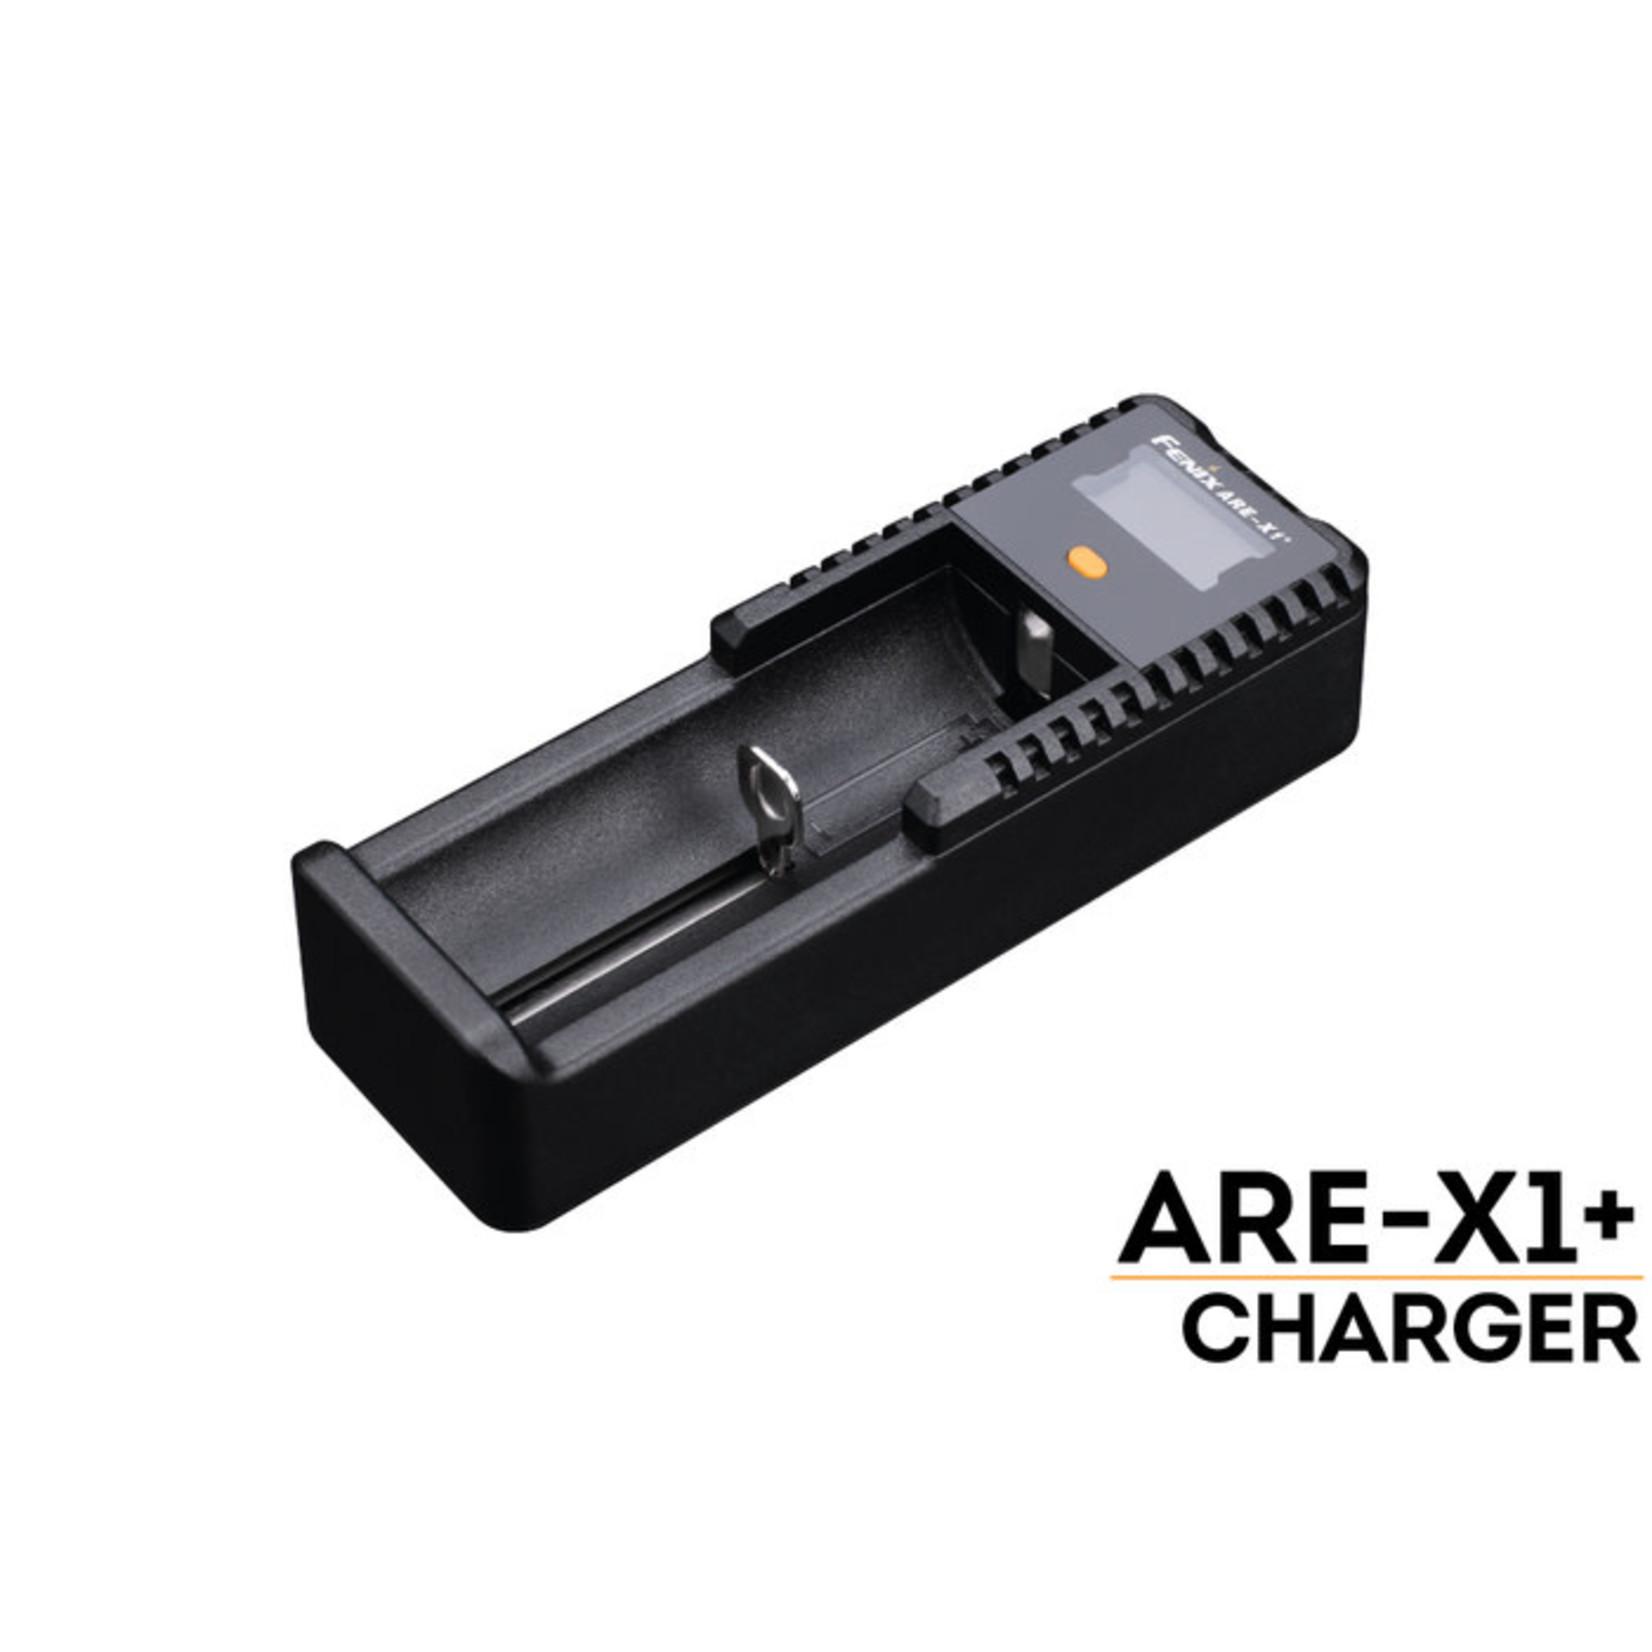 Fenix Fenix ARE-1+ Smart Battery Charger